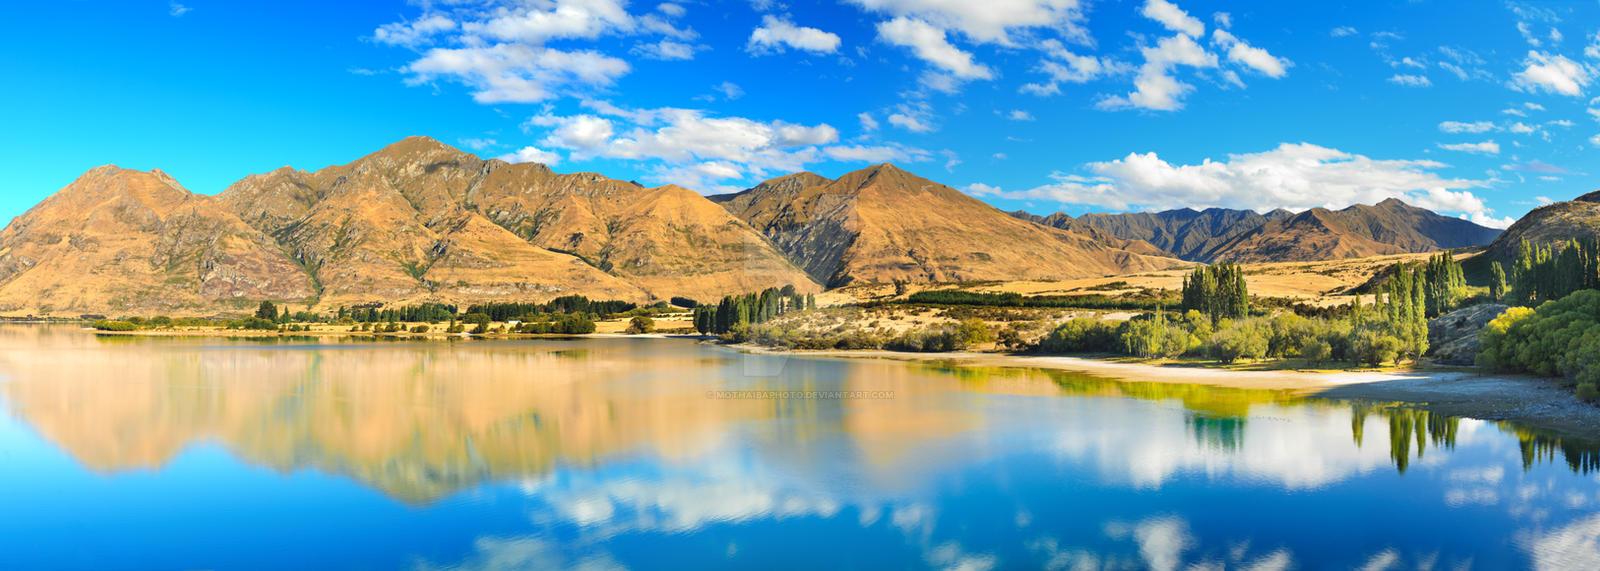 Wanaka lake by MotHaiBaPhoto